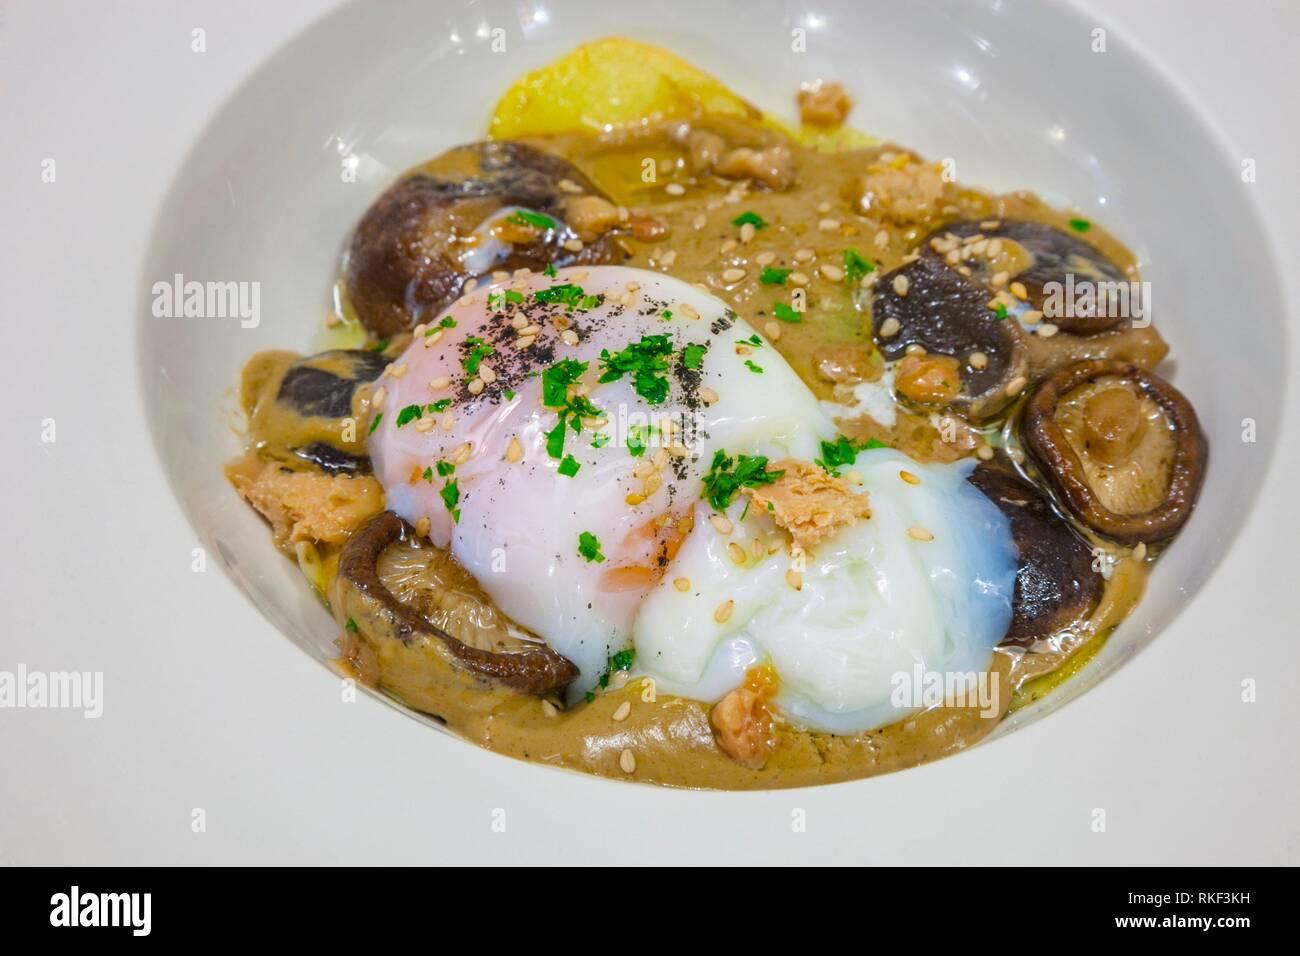 Truffled egg, béchamel of mushrooms and foie toast. La Garrocha Restaurant, Valladolid, Castilla y Leon, Spain Stock Photo